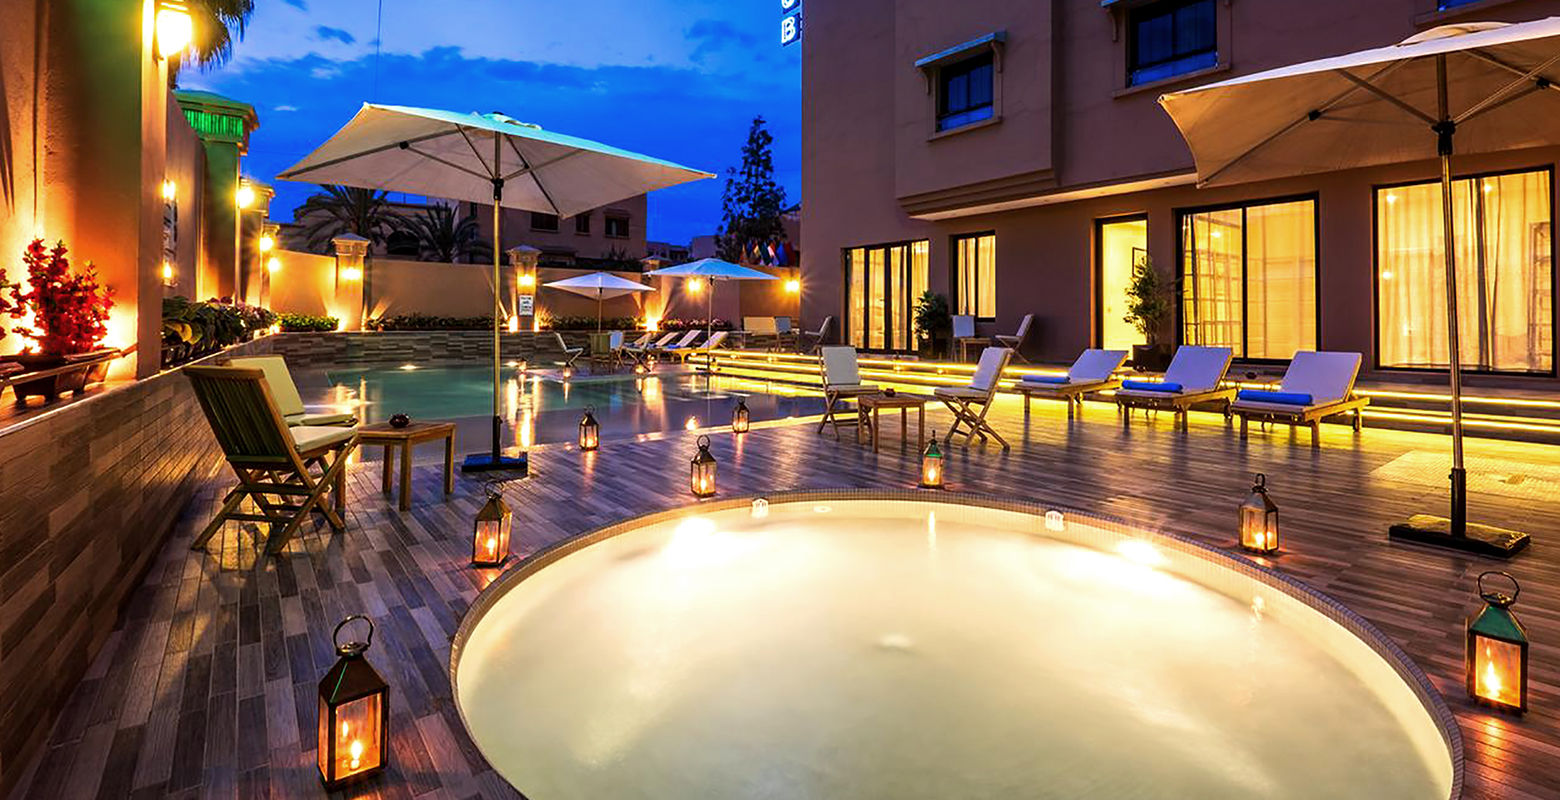 Hôtel Ayoub & Spa 4*